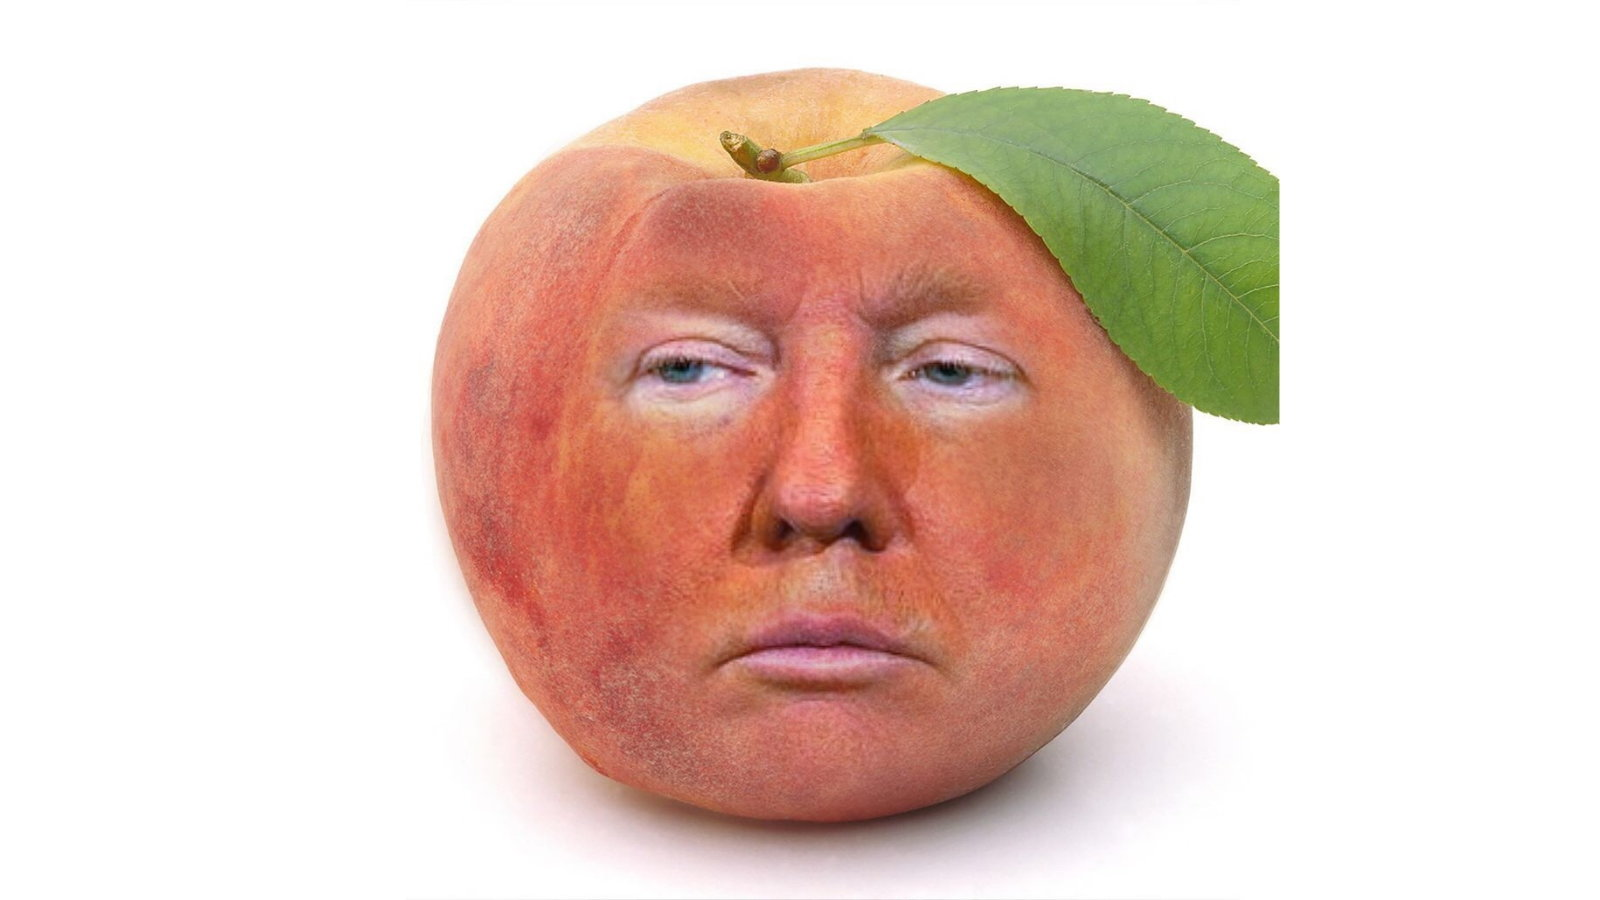 Chubby Cheeks Lift + Plump Sheet Mask by Peach & Lily #13